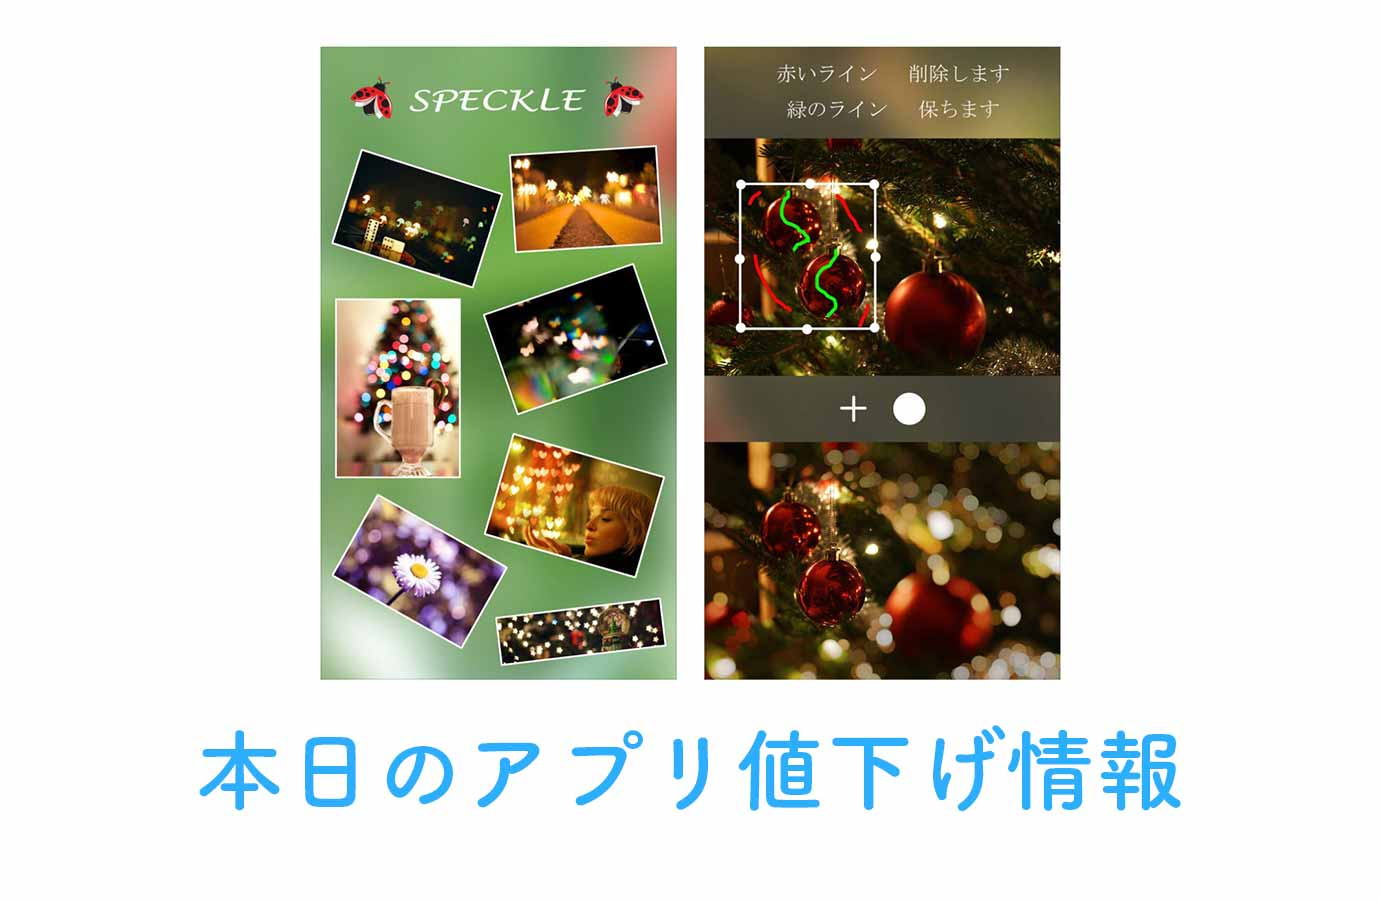 Appsale0930